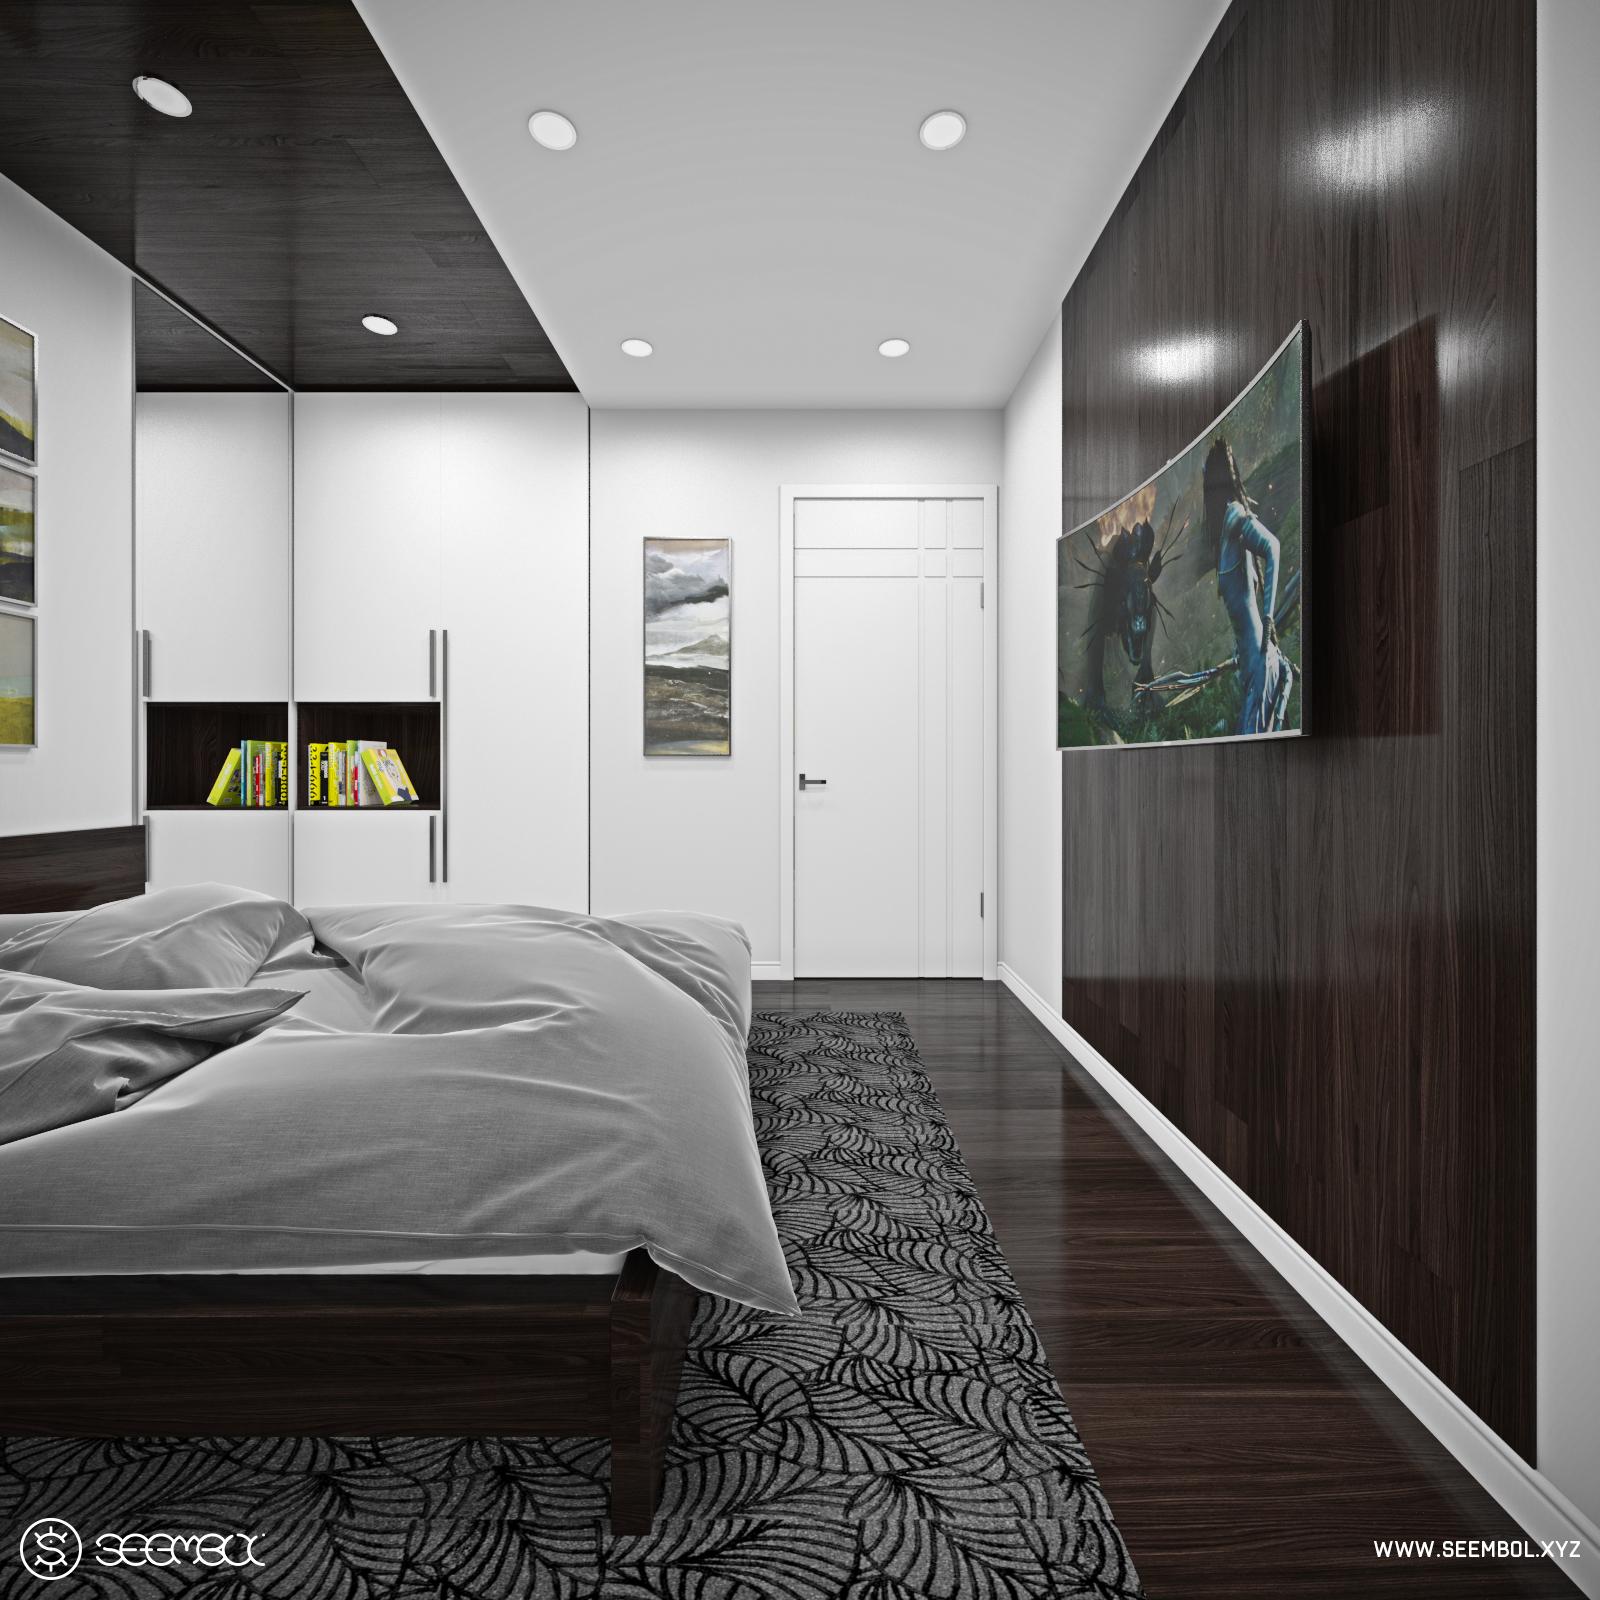 Blender interior design test in real production workflow